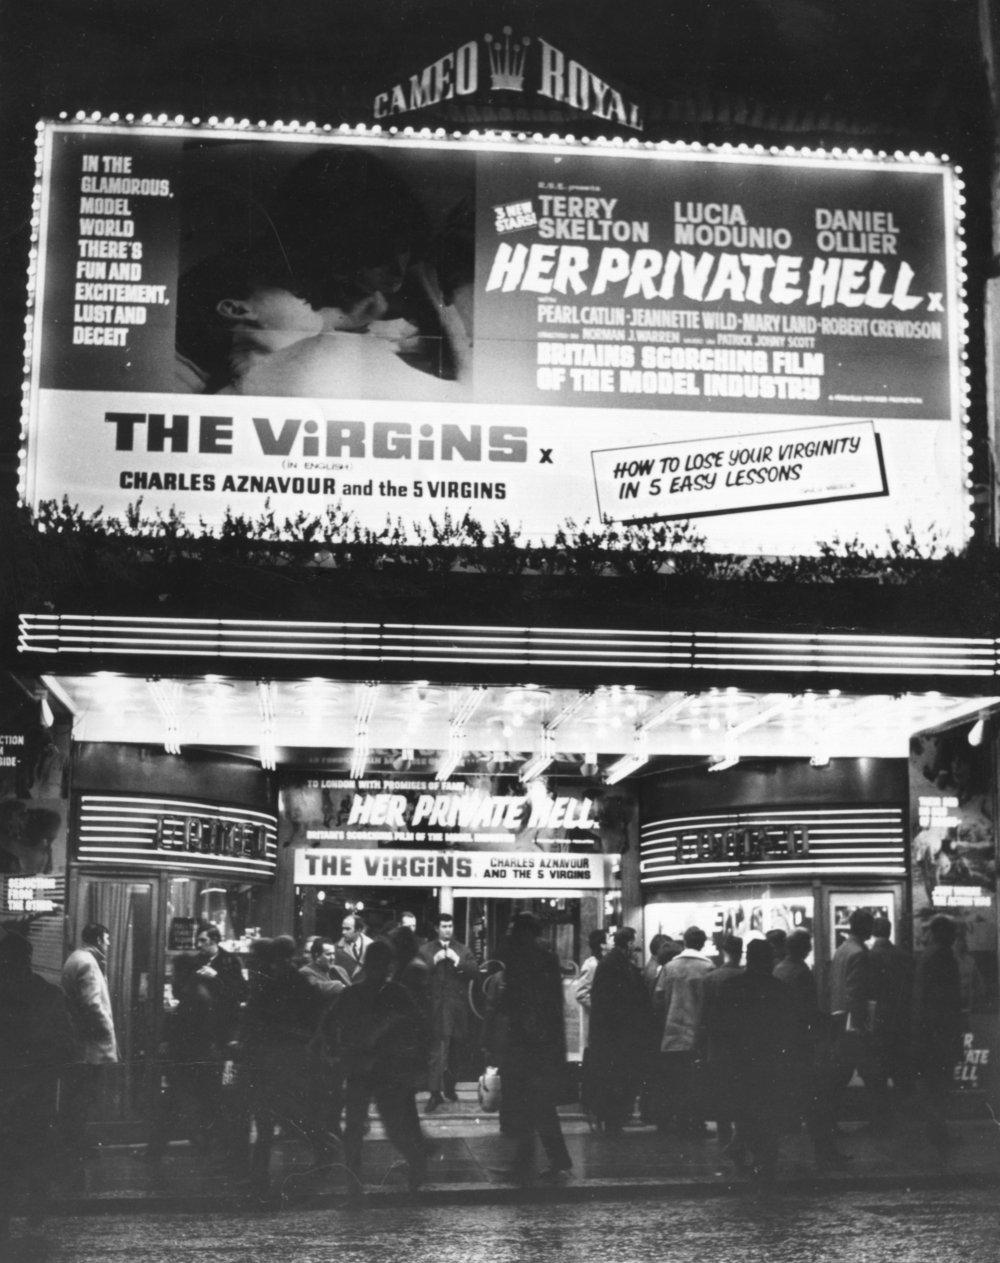 Cameo Royal Cinema, Great Windmill Street, London, 1967